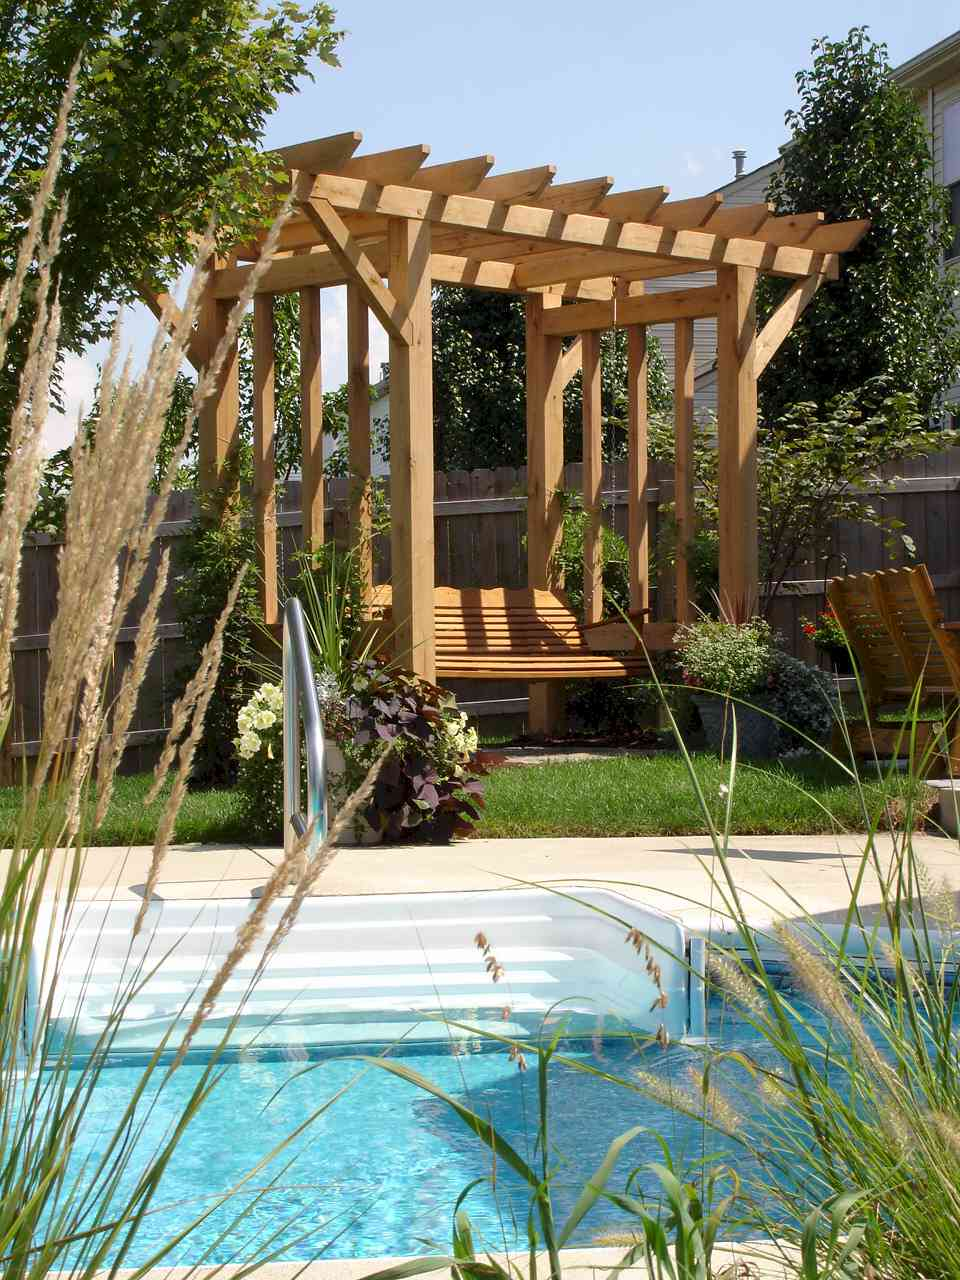 Easy building shed and garage arbor swings design arbor for Garden arbor designs